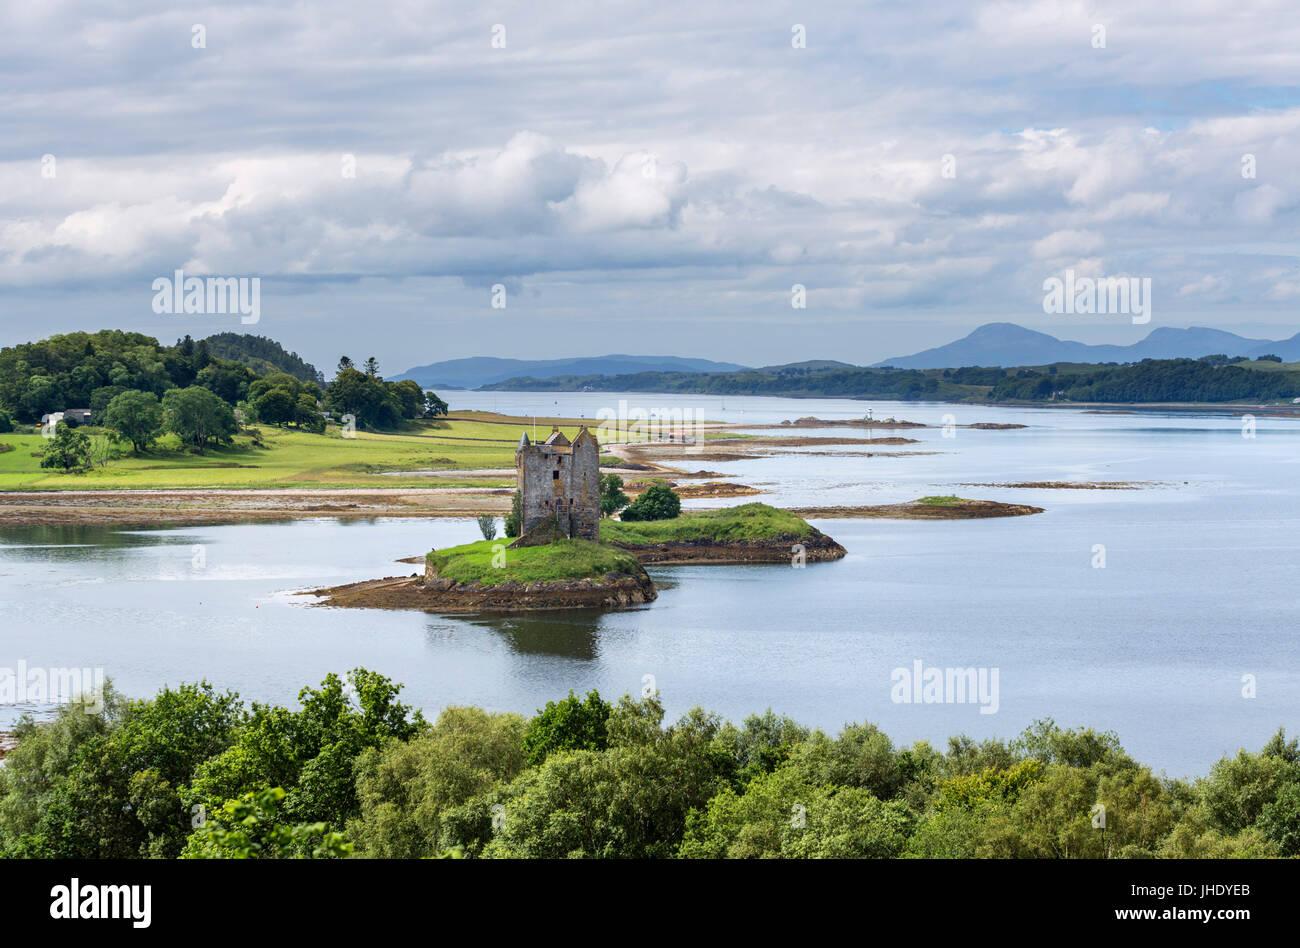 Castle Stalker, Loch Laich, Port Appin, Argyll and Bute, Scotland, UK. Scottish landscape / landscapes - Stock Image